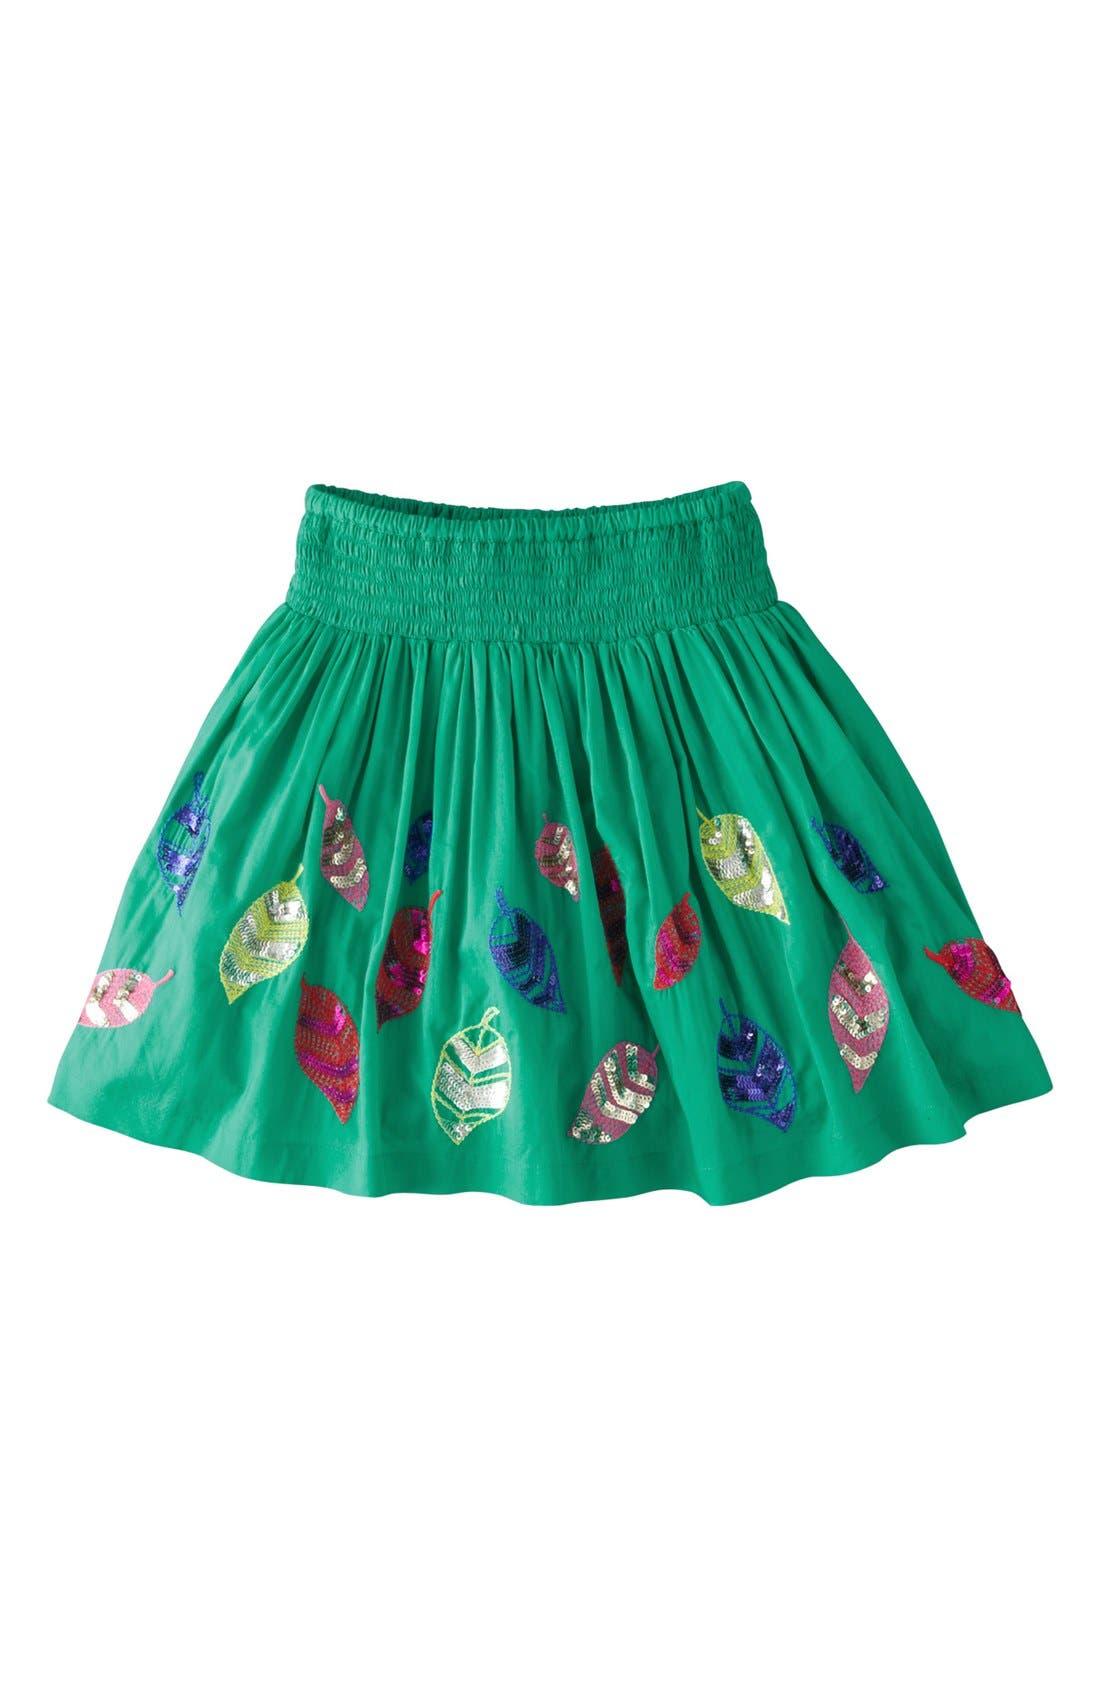 Alternate Image 1 Selected - Mini Boden 'Decorative' Cotton Voile Skirt (Toddler Girls, Little Girls & Big Girls)